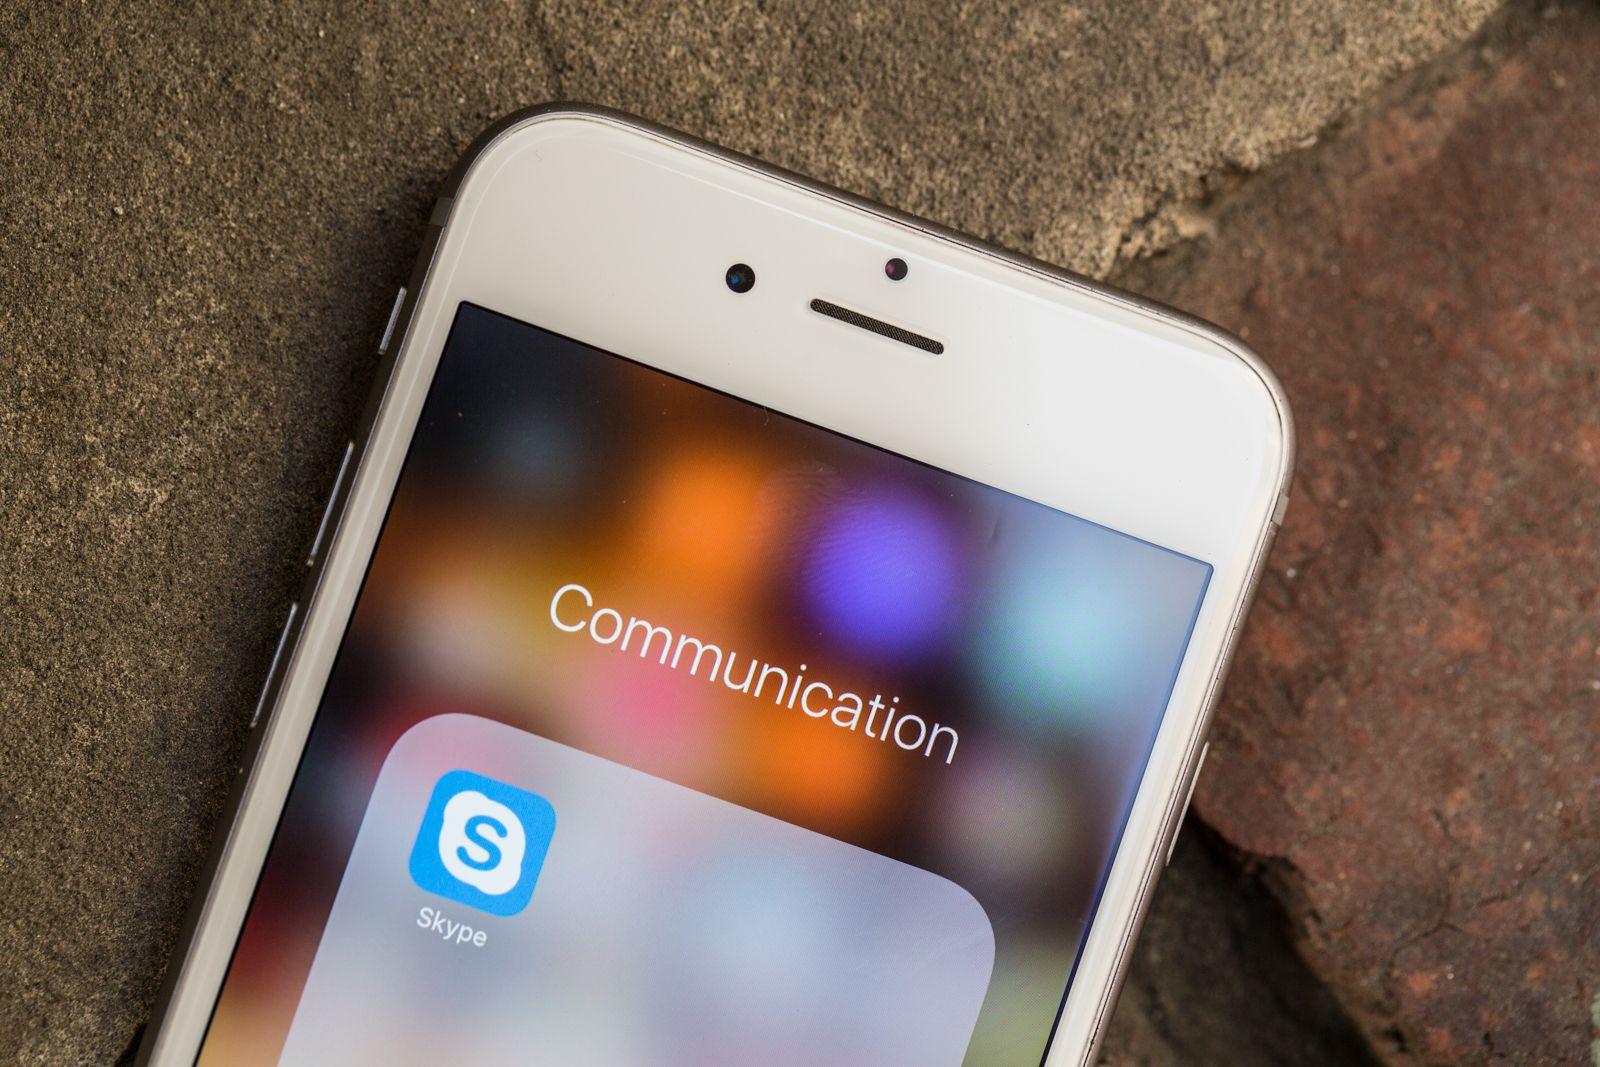 skype-iphone-6s-4822-001.jpg